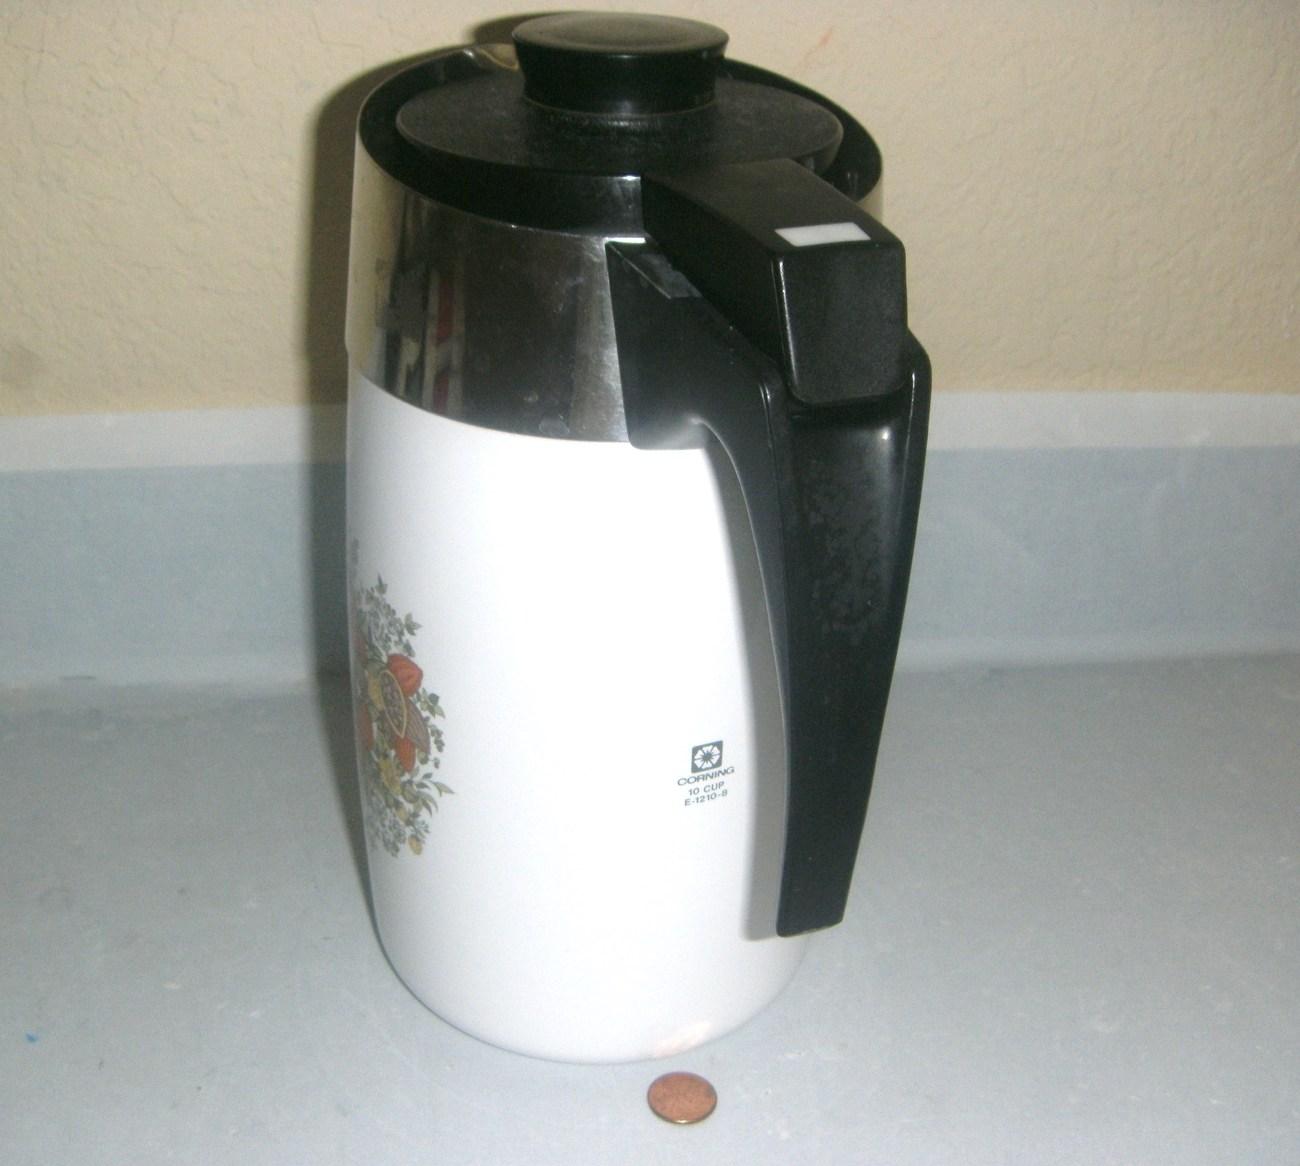 Vintage Corning Coffee 10 Cup Electric Percolator E-1210-8